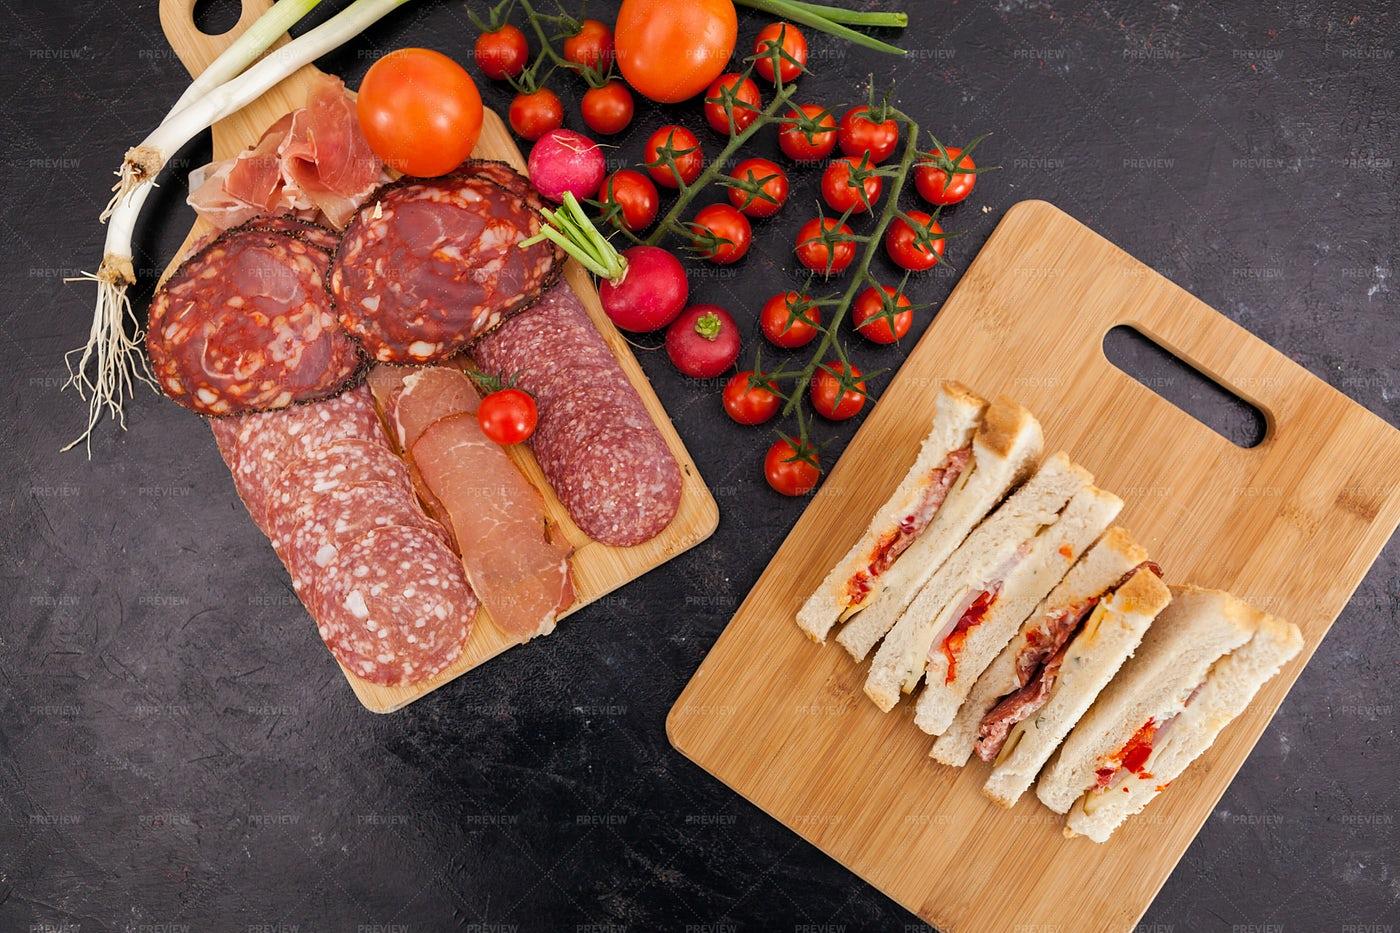 Antipasto Platter And Sandwiches: Stock Photos